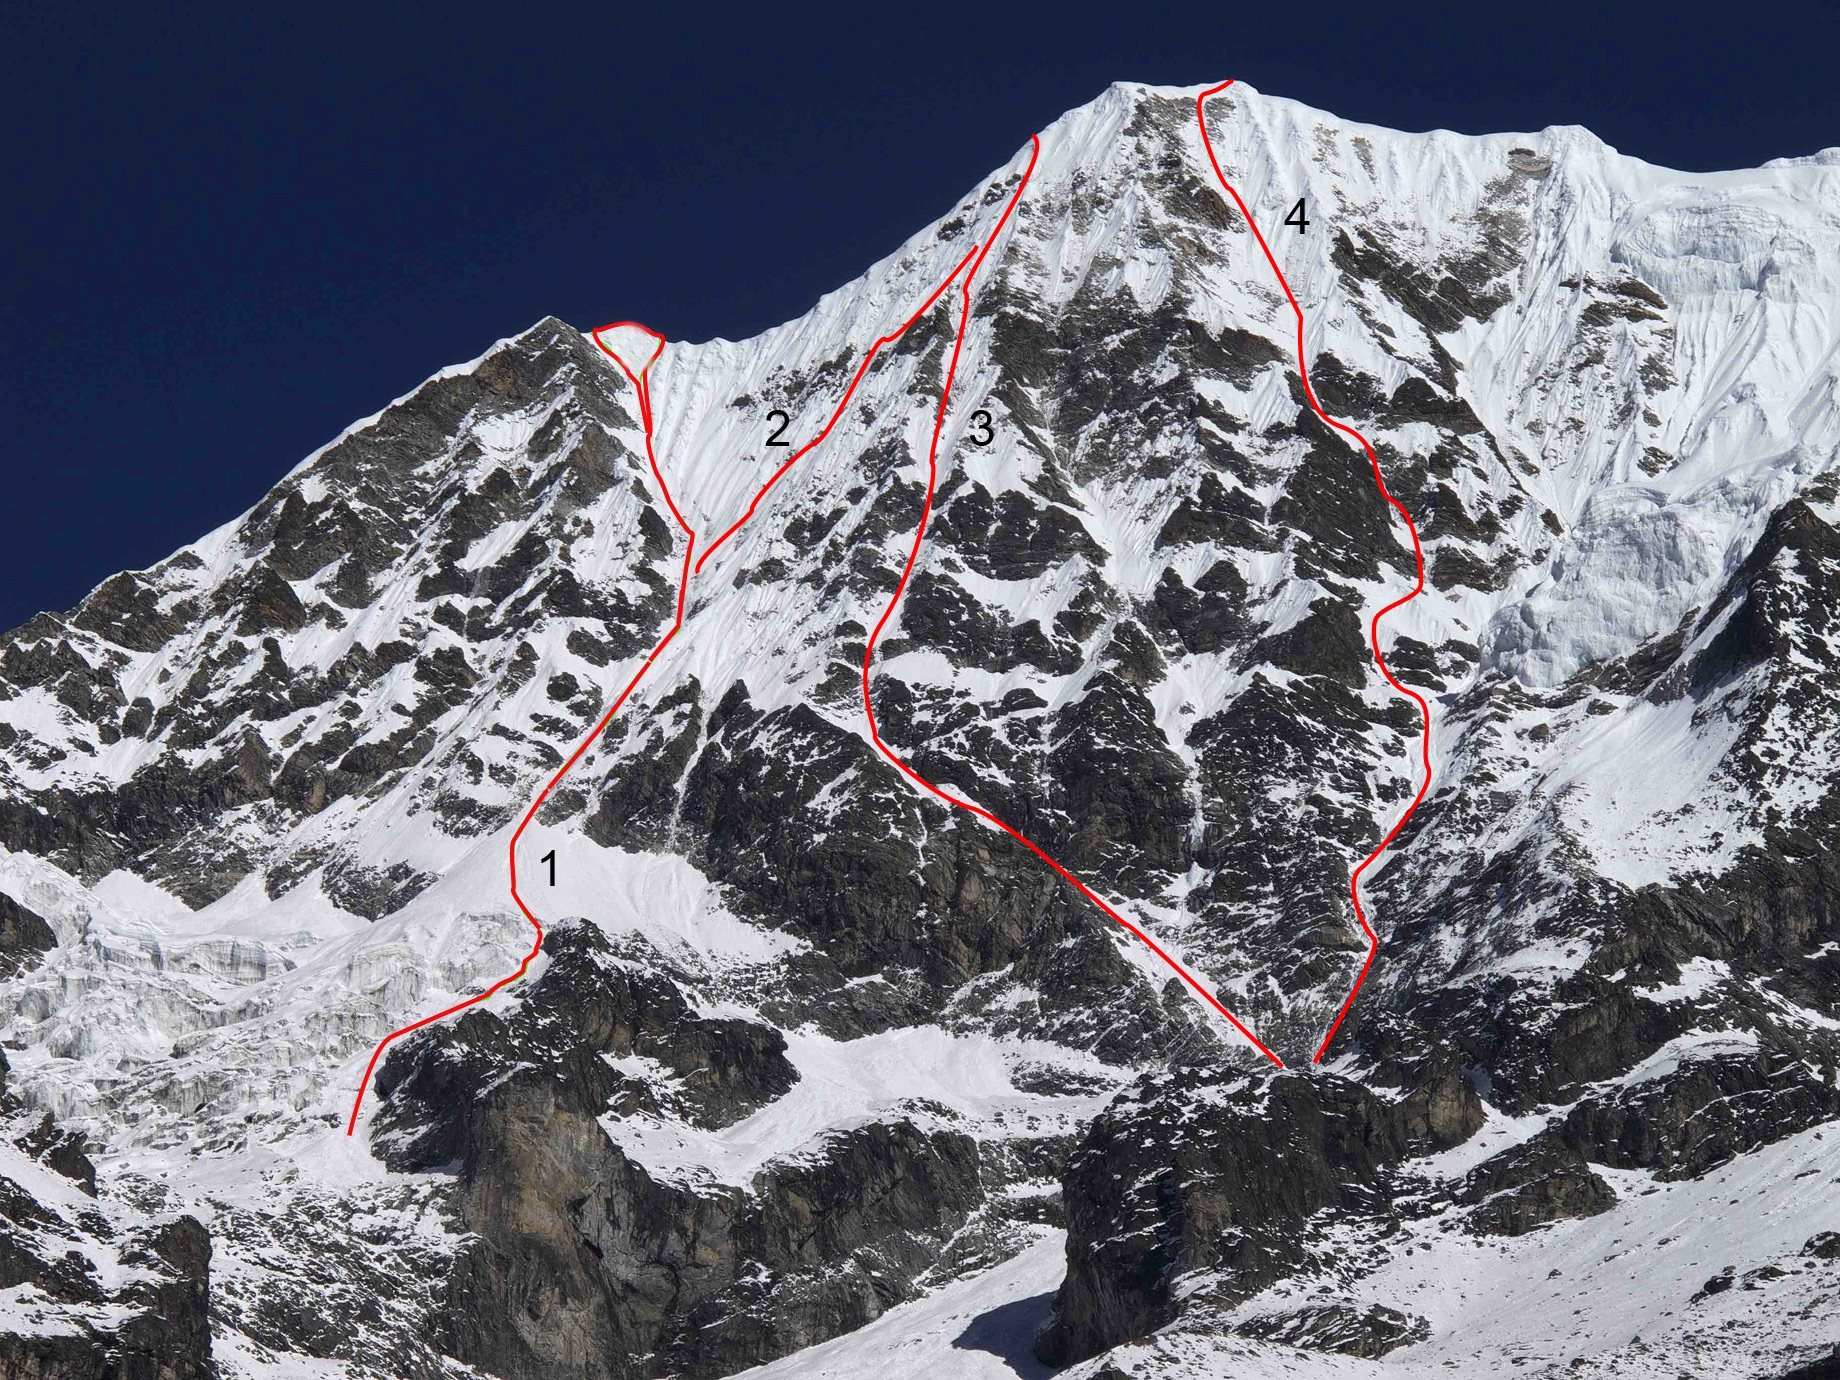 The south face of Chekigo. (1) South face of Chekigo Sano. (2) Descent from Via Sopeti. (3) Via Sopeti (not to summit). (4) Shiva–Straight to the Top.